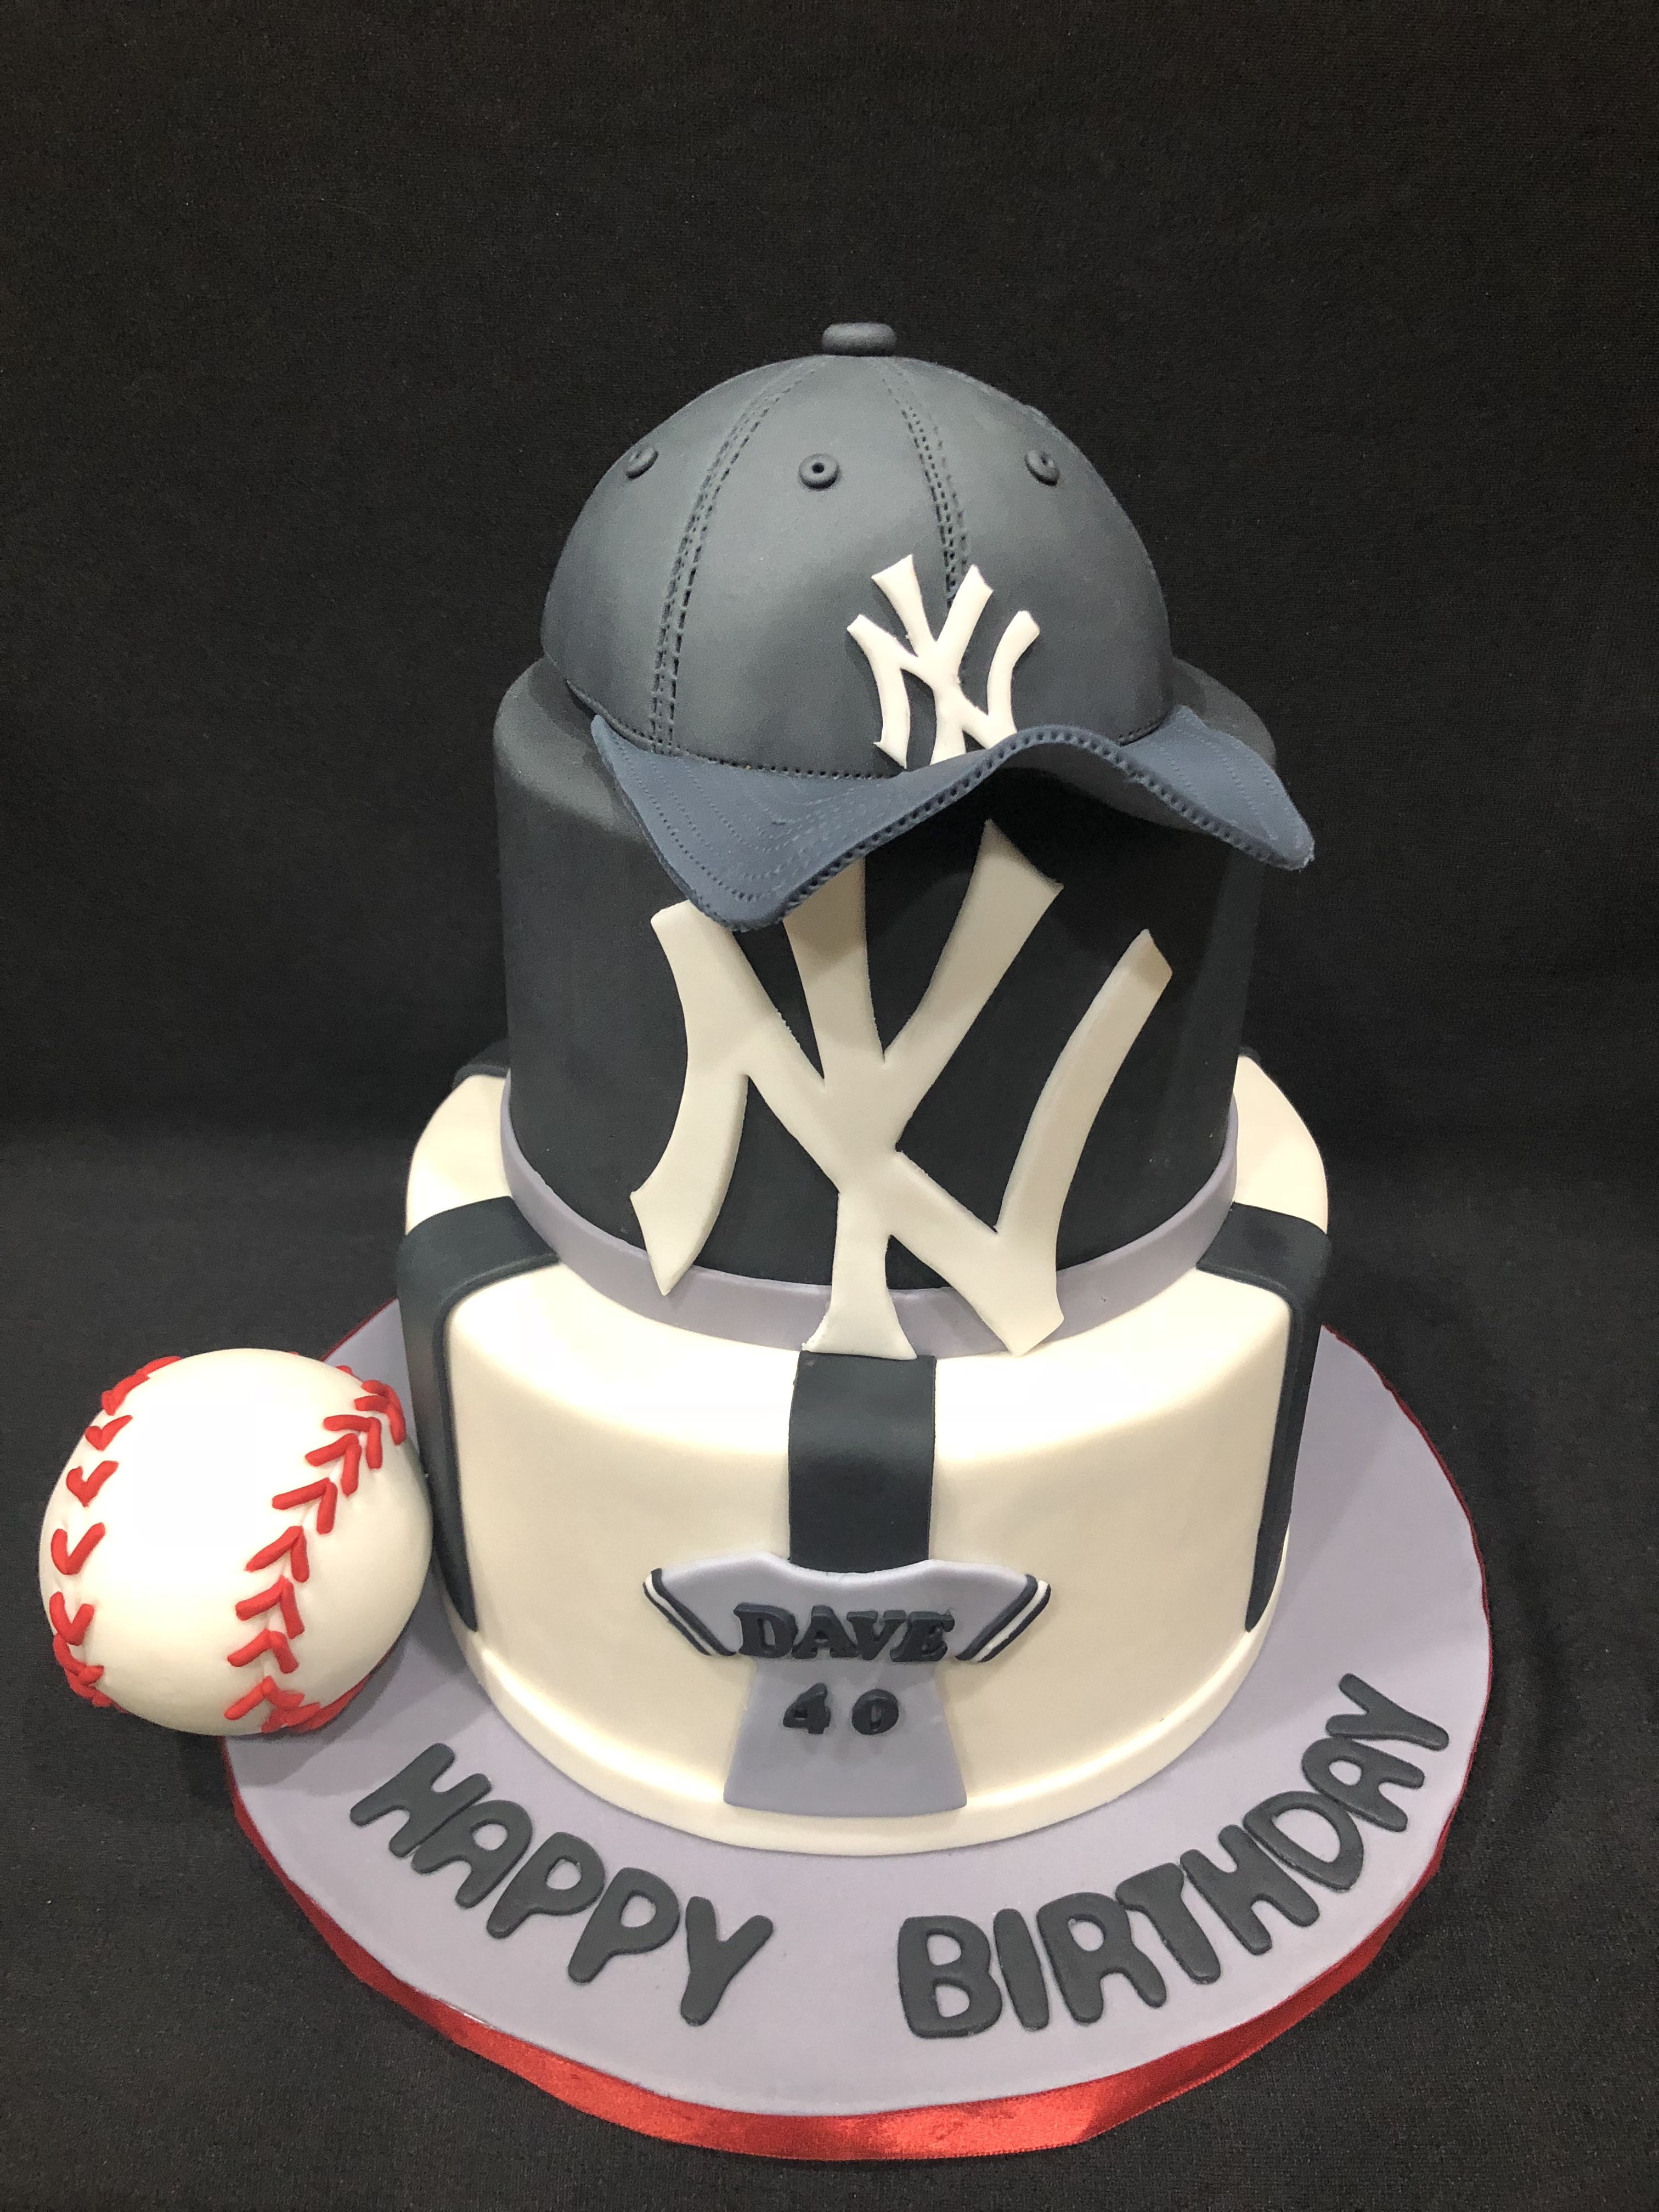 Phenomenal New York Yankees Birthday Cake With Images Yankees Birthday Funny Birthday Cards Online Benoljebrpdamsfinfo